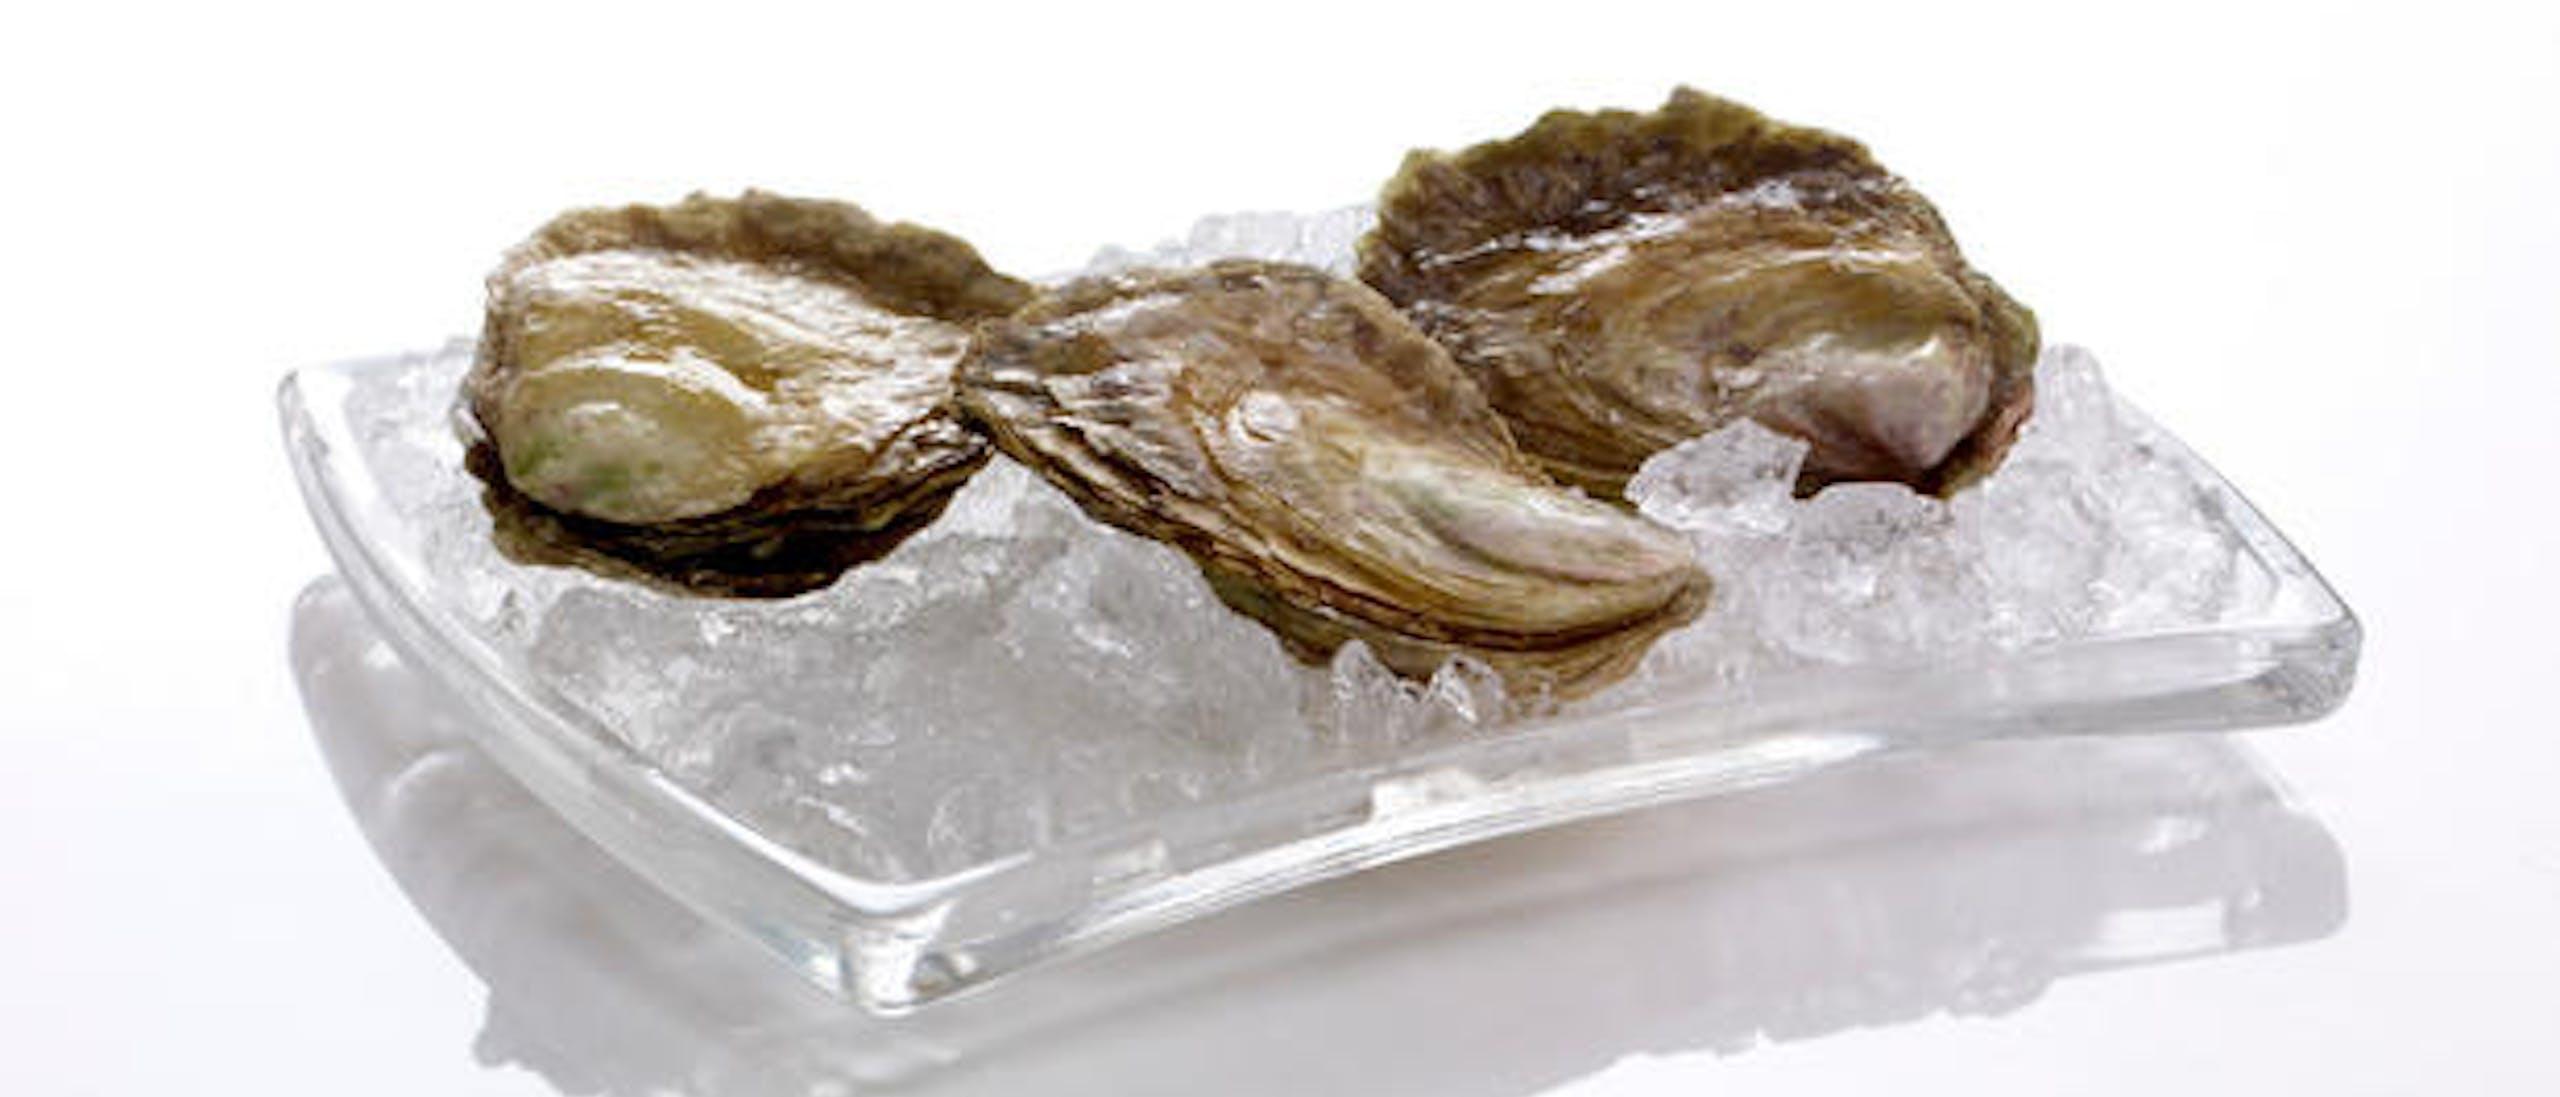 AApning-av-oesters large